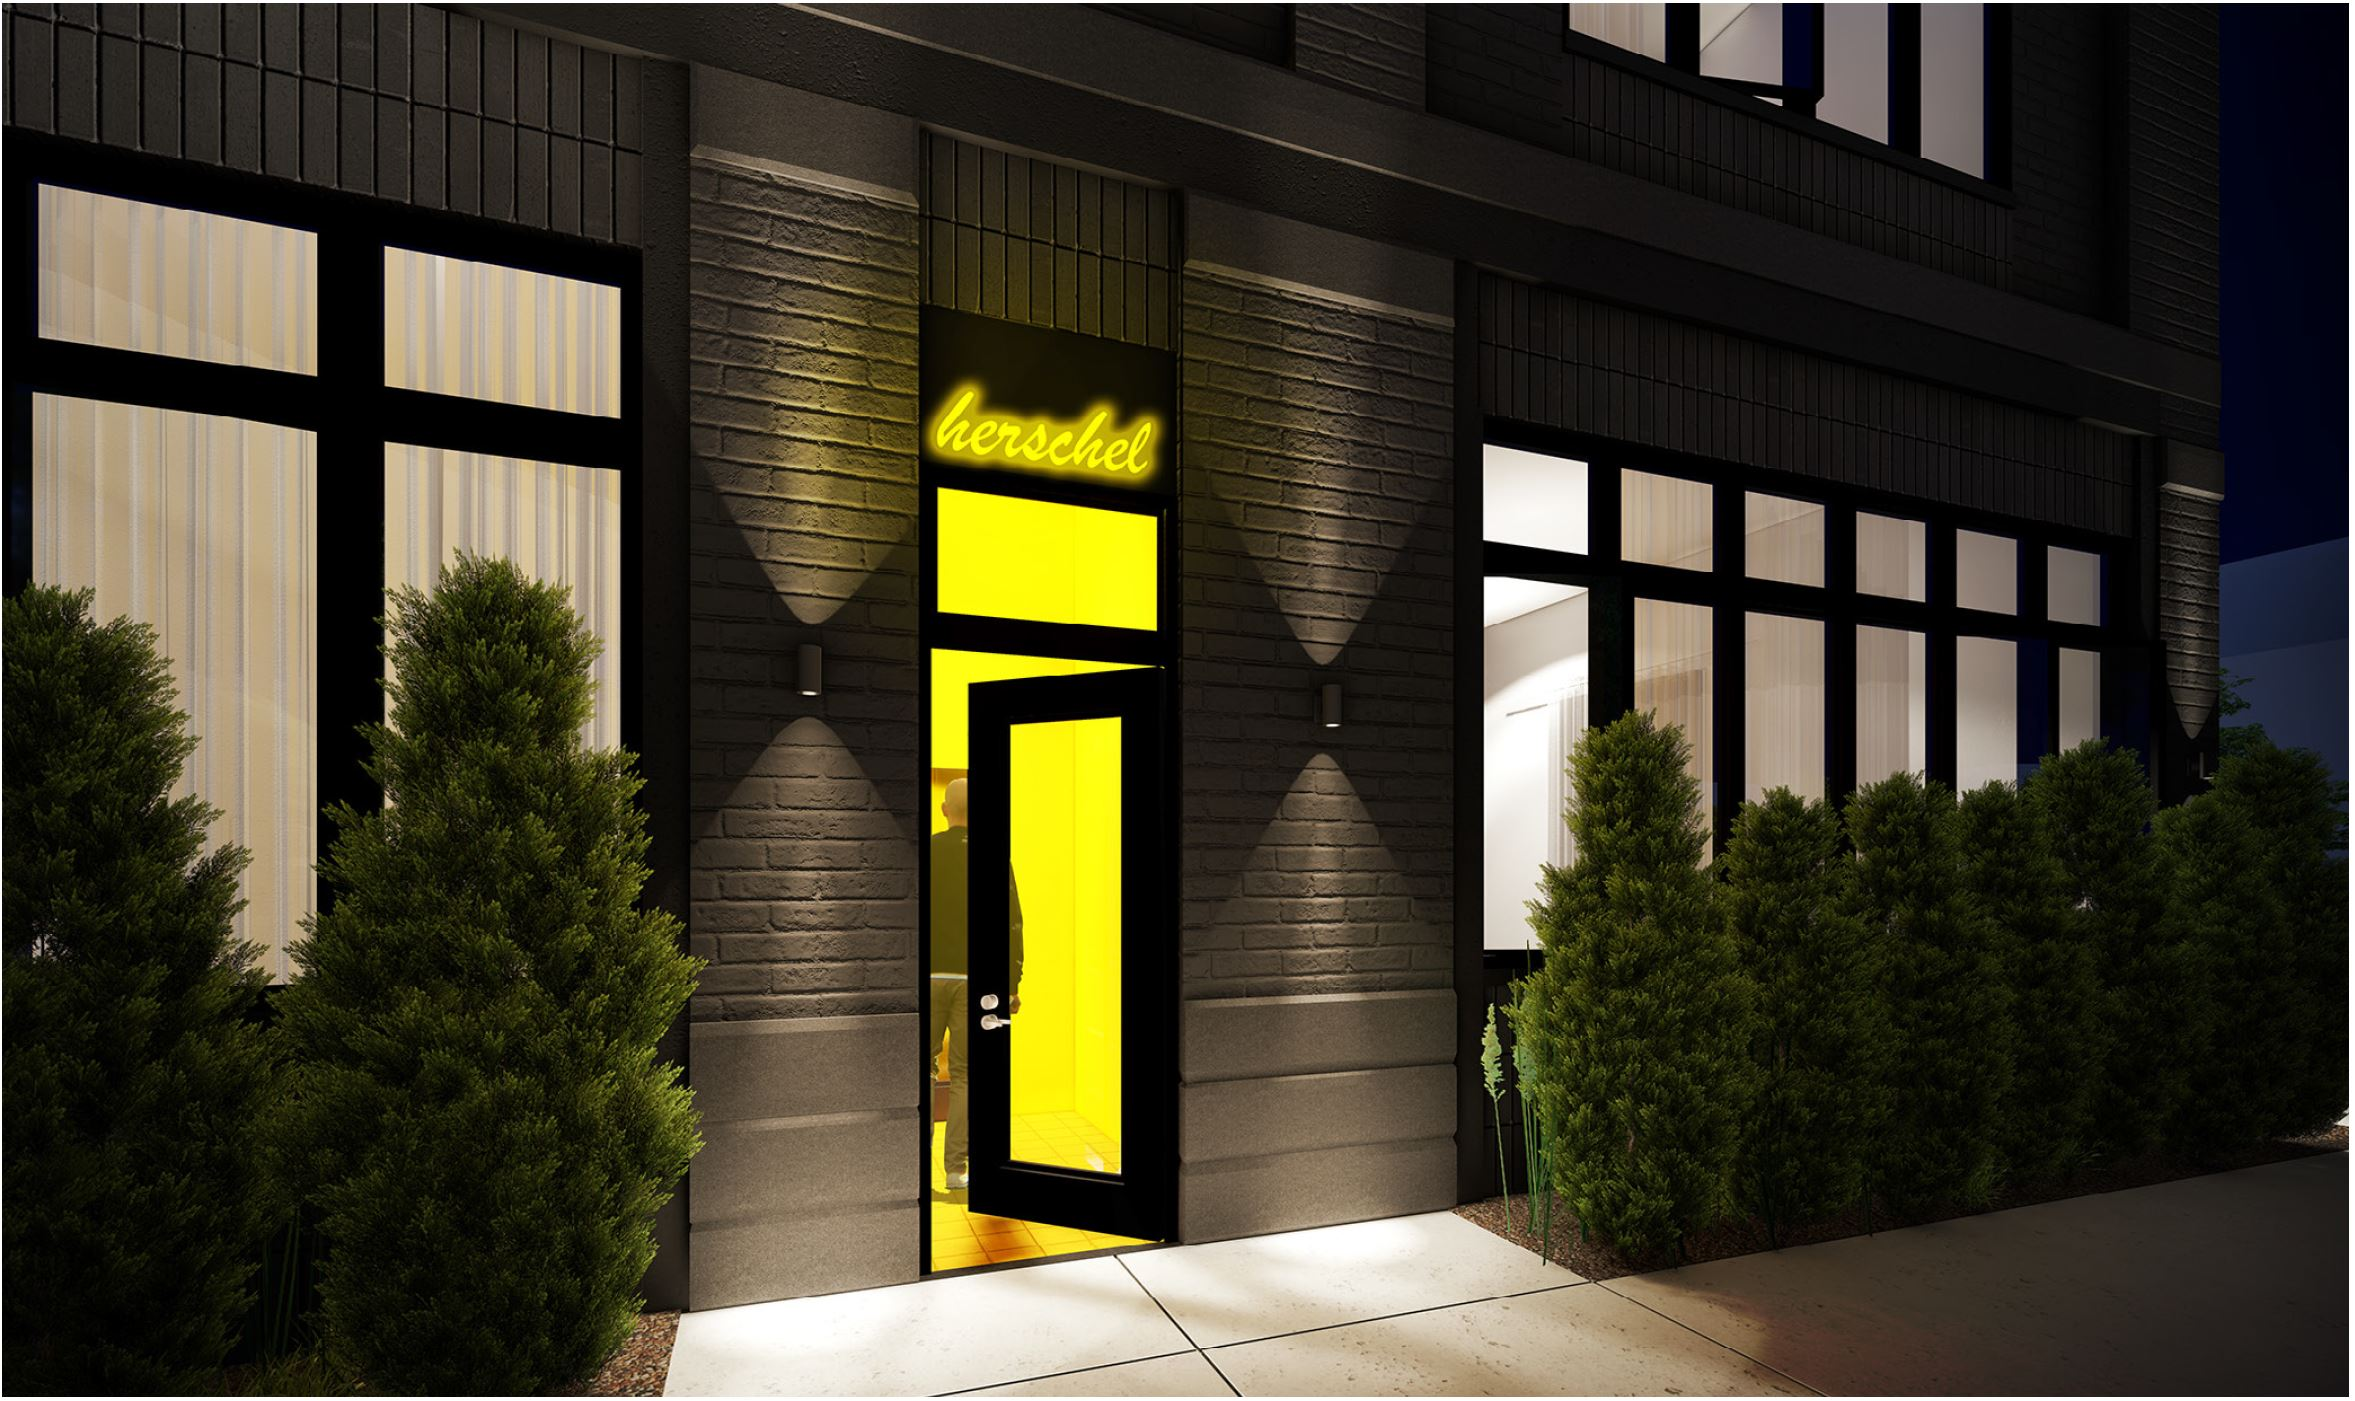 Unit 201 | $235,000    1 bed 1 bath 828 sq. ft. $235,000 basement storage